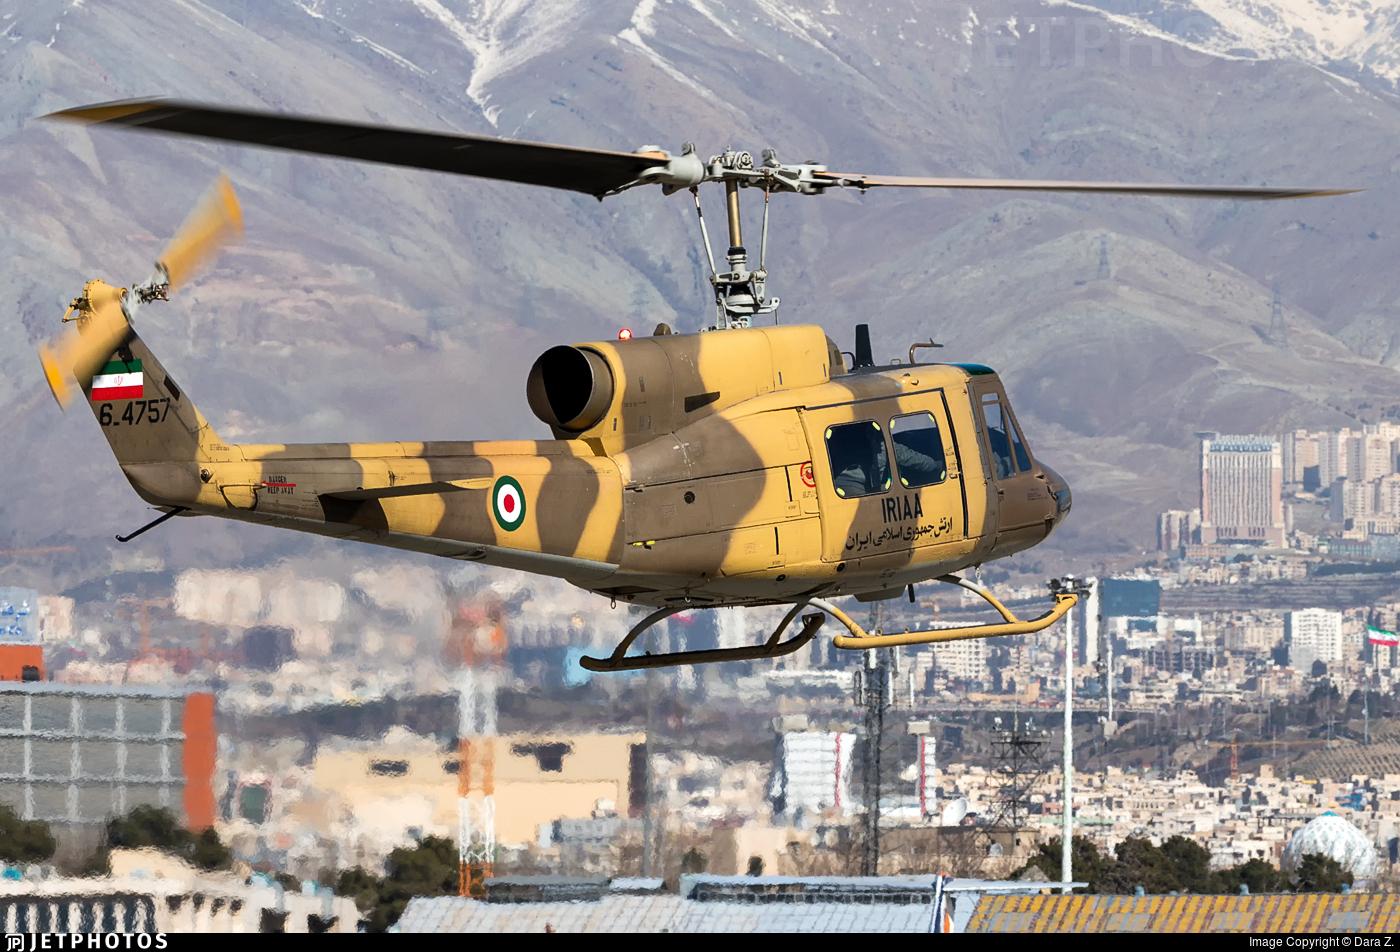 6-4757 | Bell 214A Isfahan | Iran - Army | Dara Z. | JetPhotos